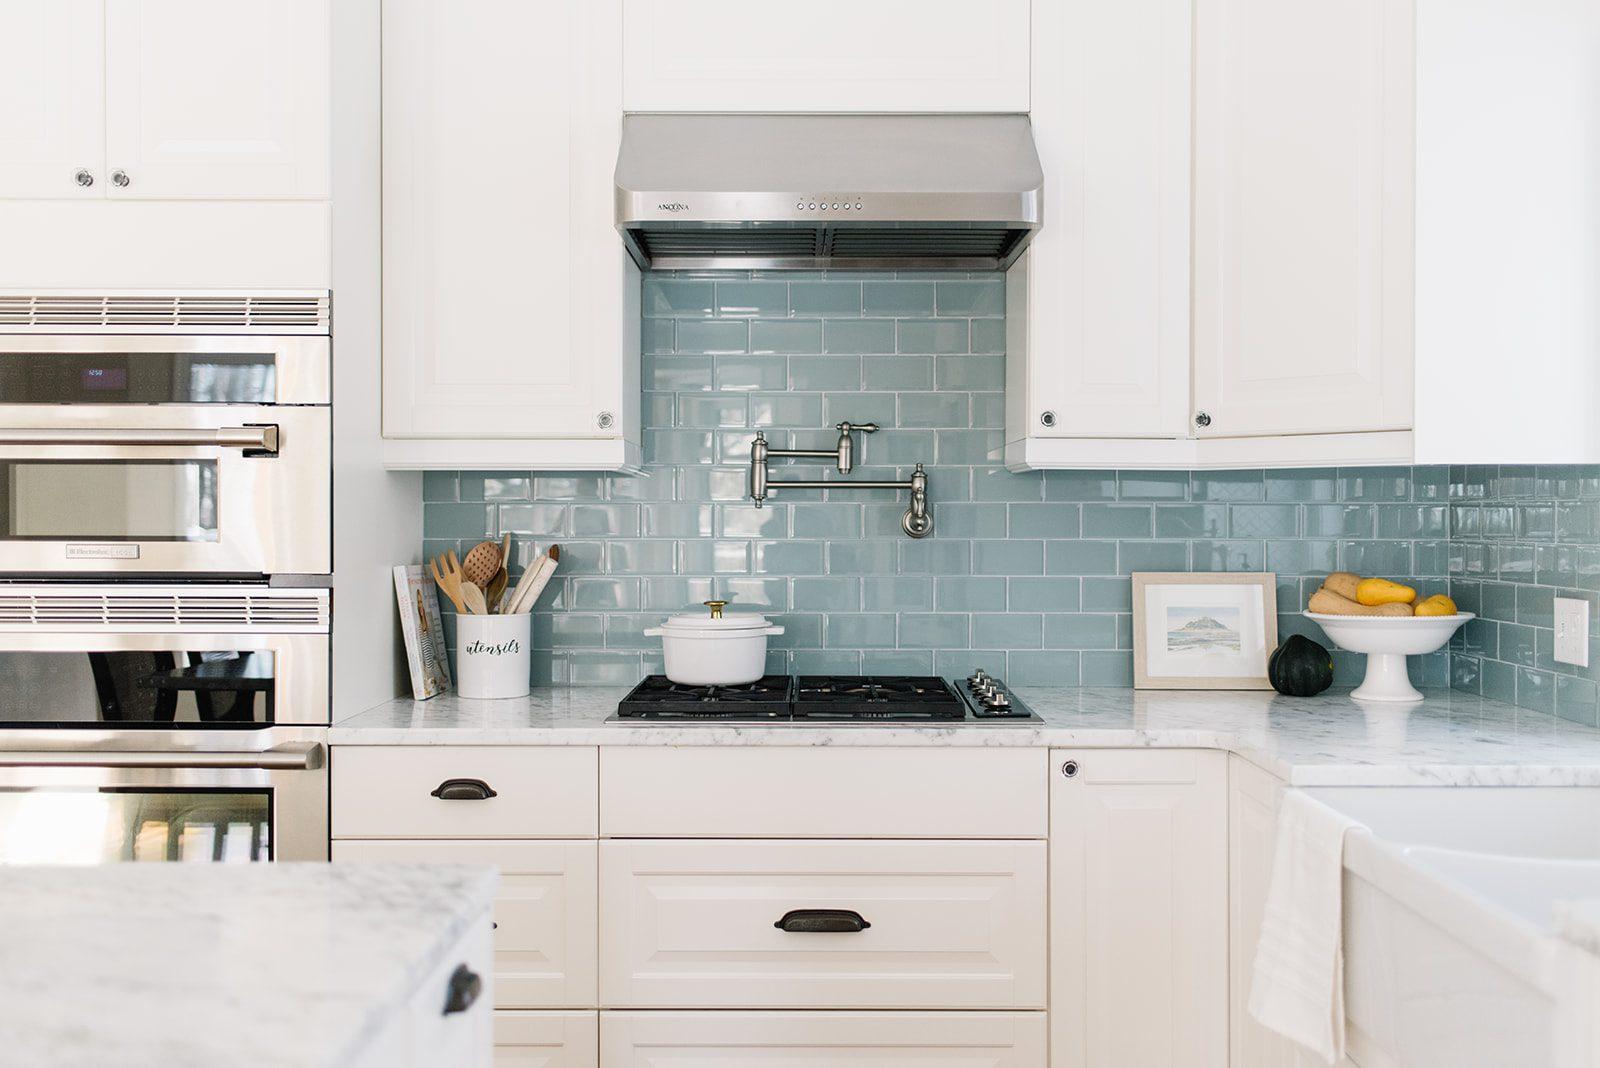 Lifestyle & DIY Home Decor Blog - The Ginger Home